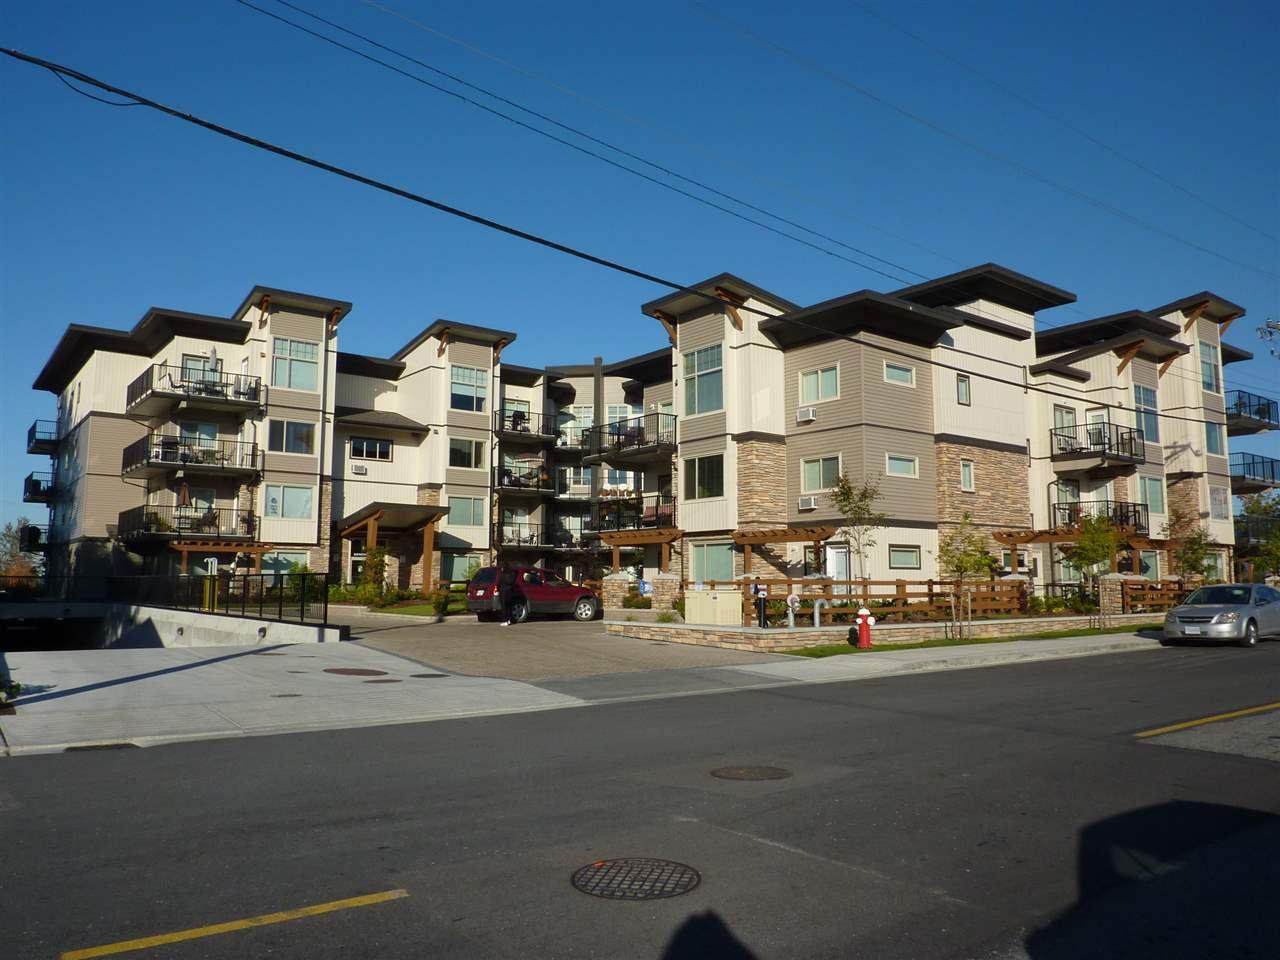 "Main Photo: 211 11935 BURNETT Street in Maple Ridge: East Central Condo for sale in ""KENSINGTON PLACE"" : MLS®# R2146036"